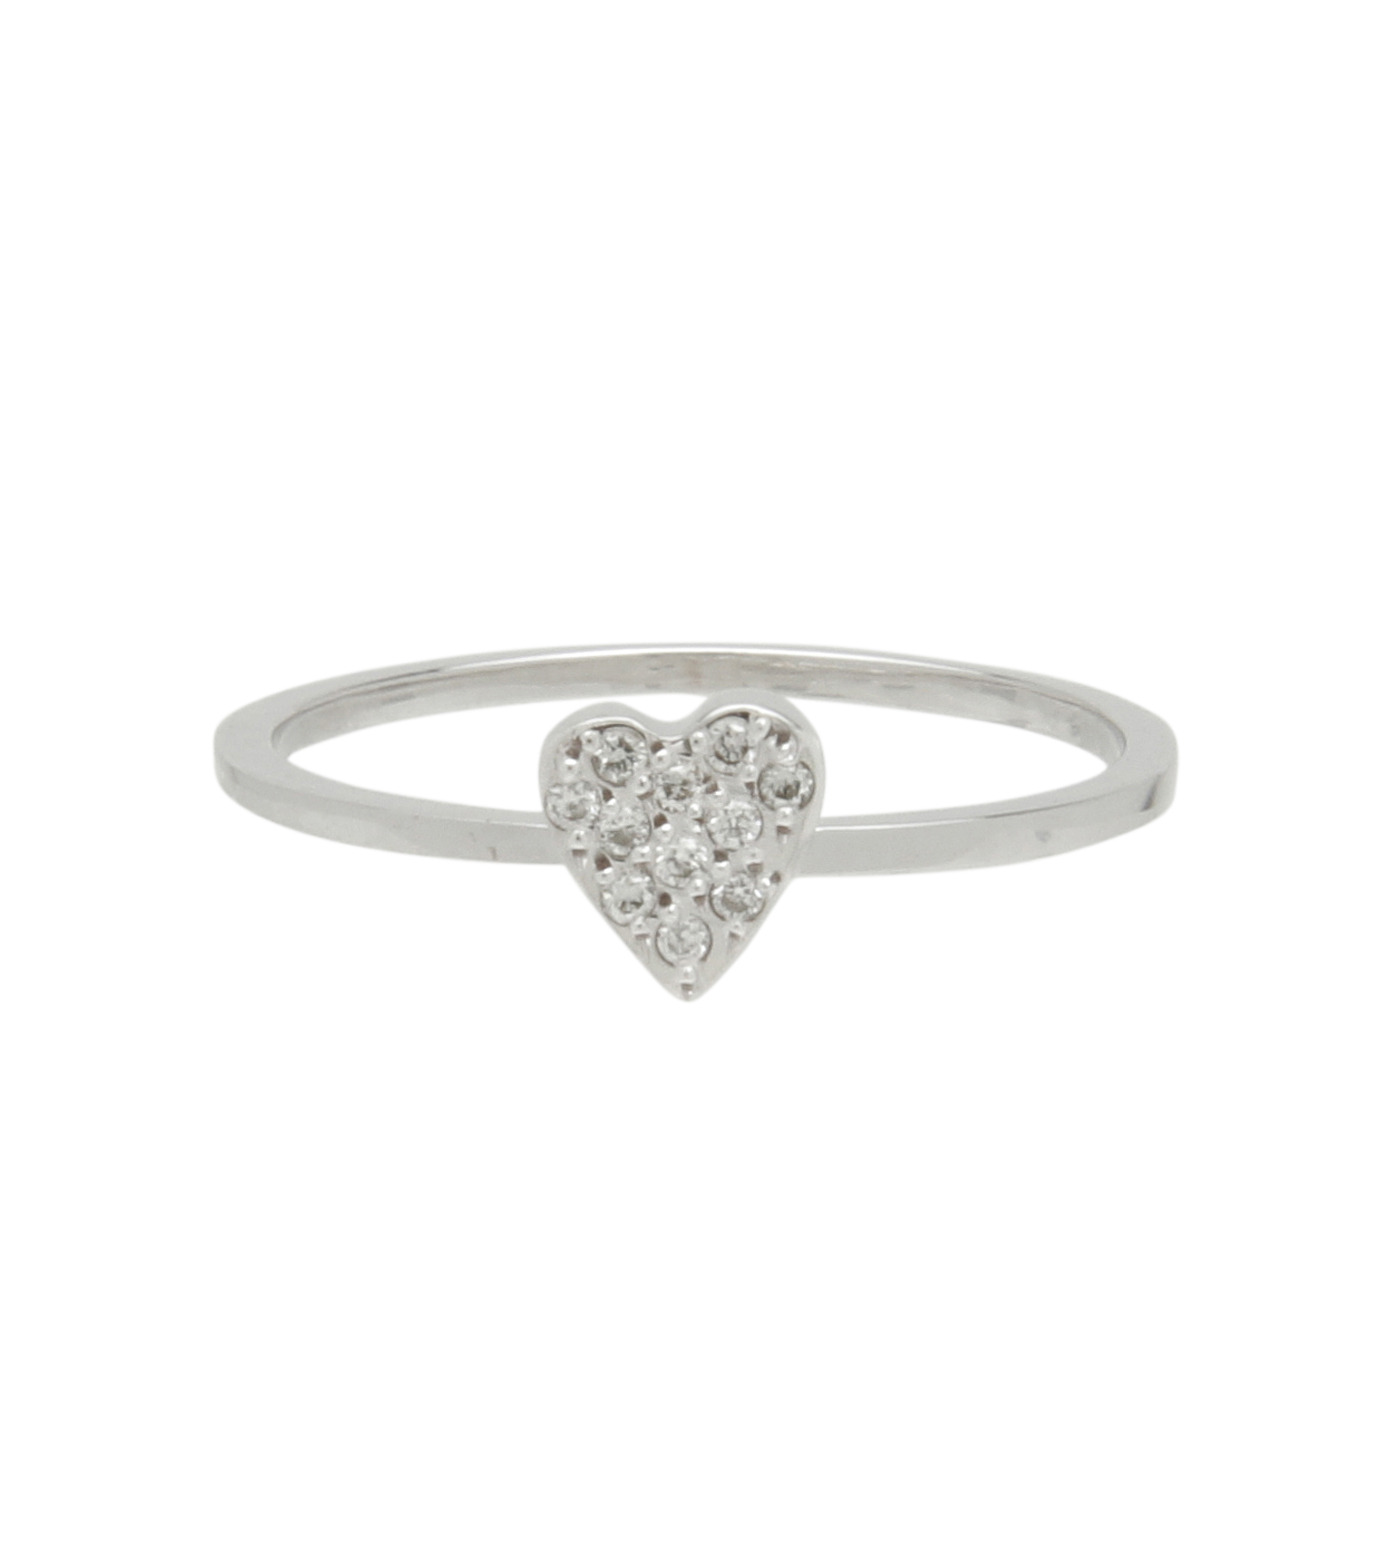 Ileana Makri(イリーナ マクリ)のLove Ring White Gold-Diamond-SILVER(リング/ring)-O272-01-001-1 拡大詳細画像1